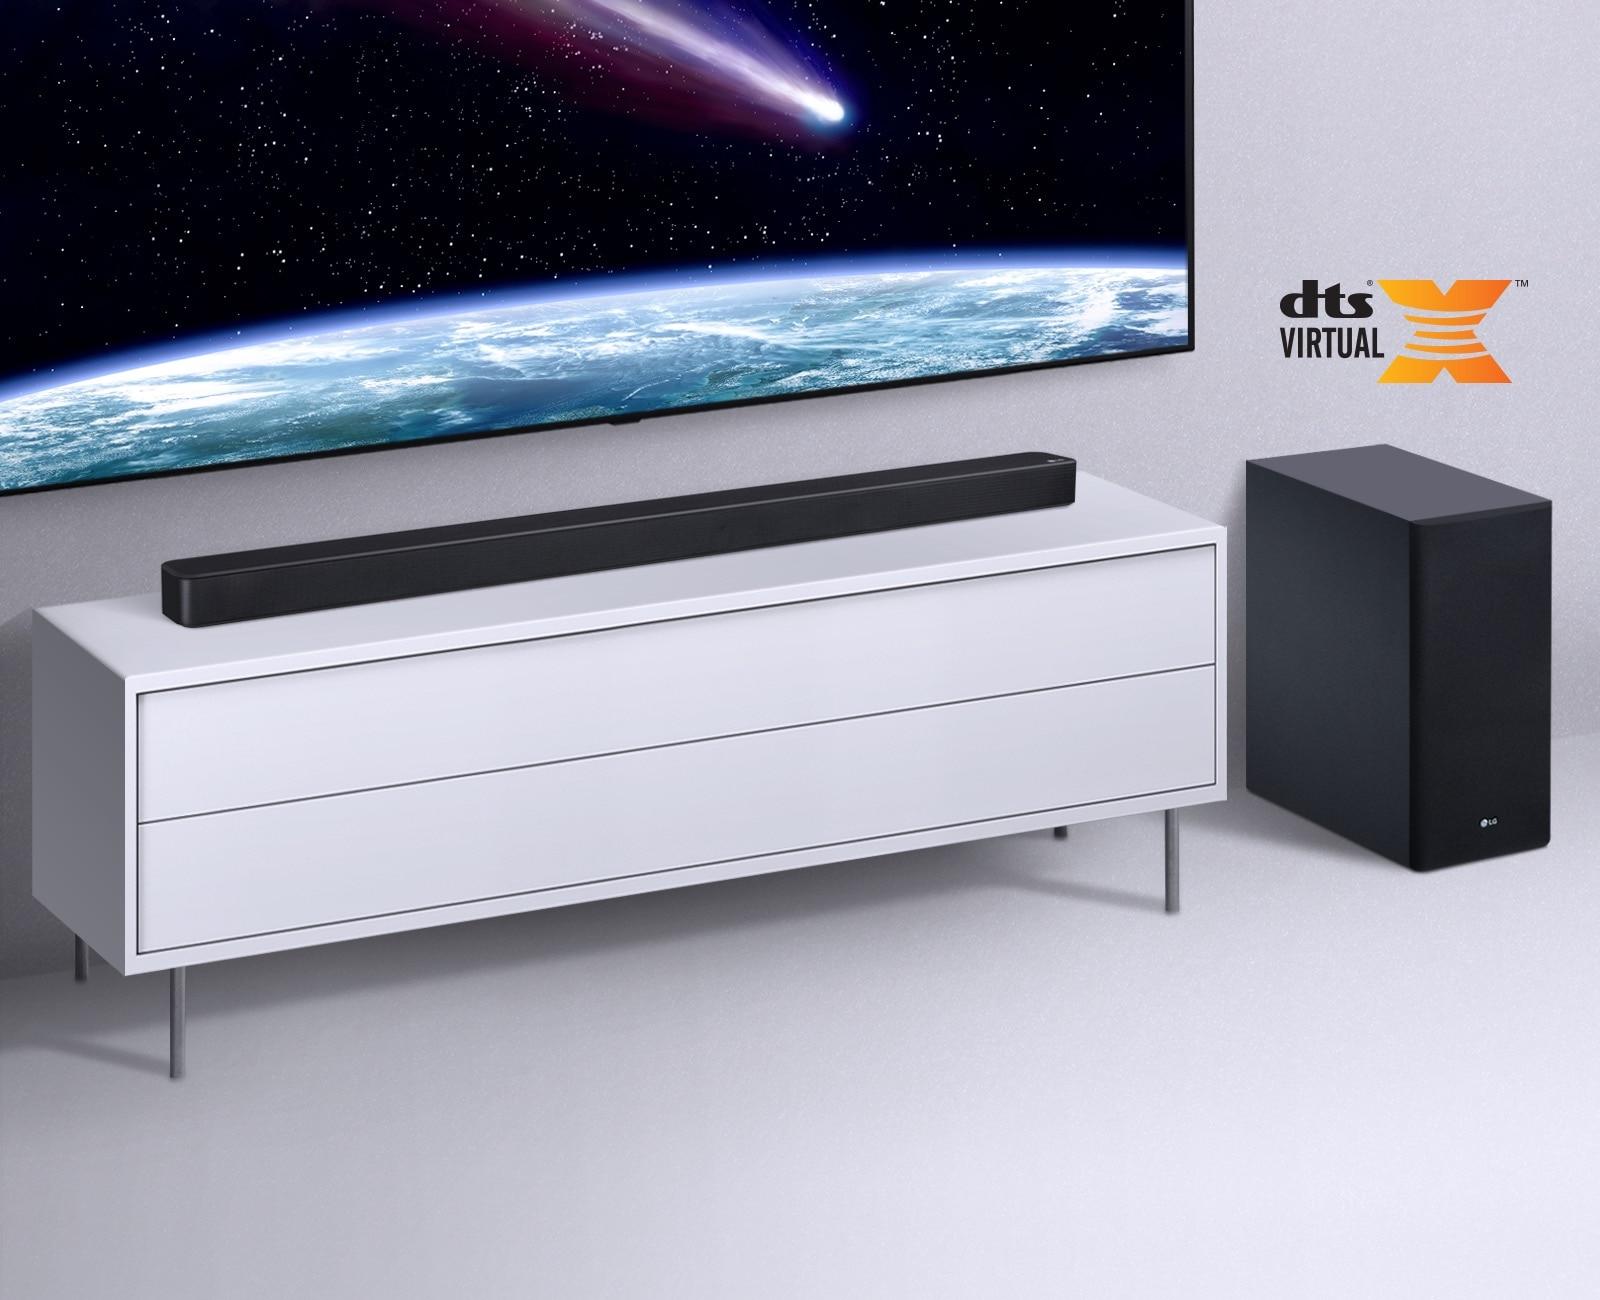 Захватывающий звук DTS Virtual:X1